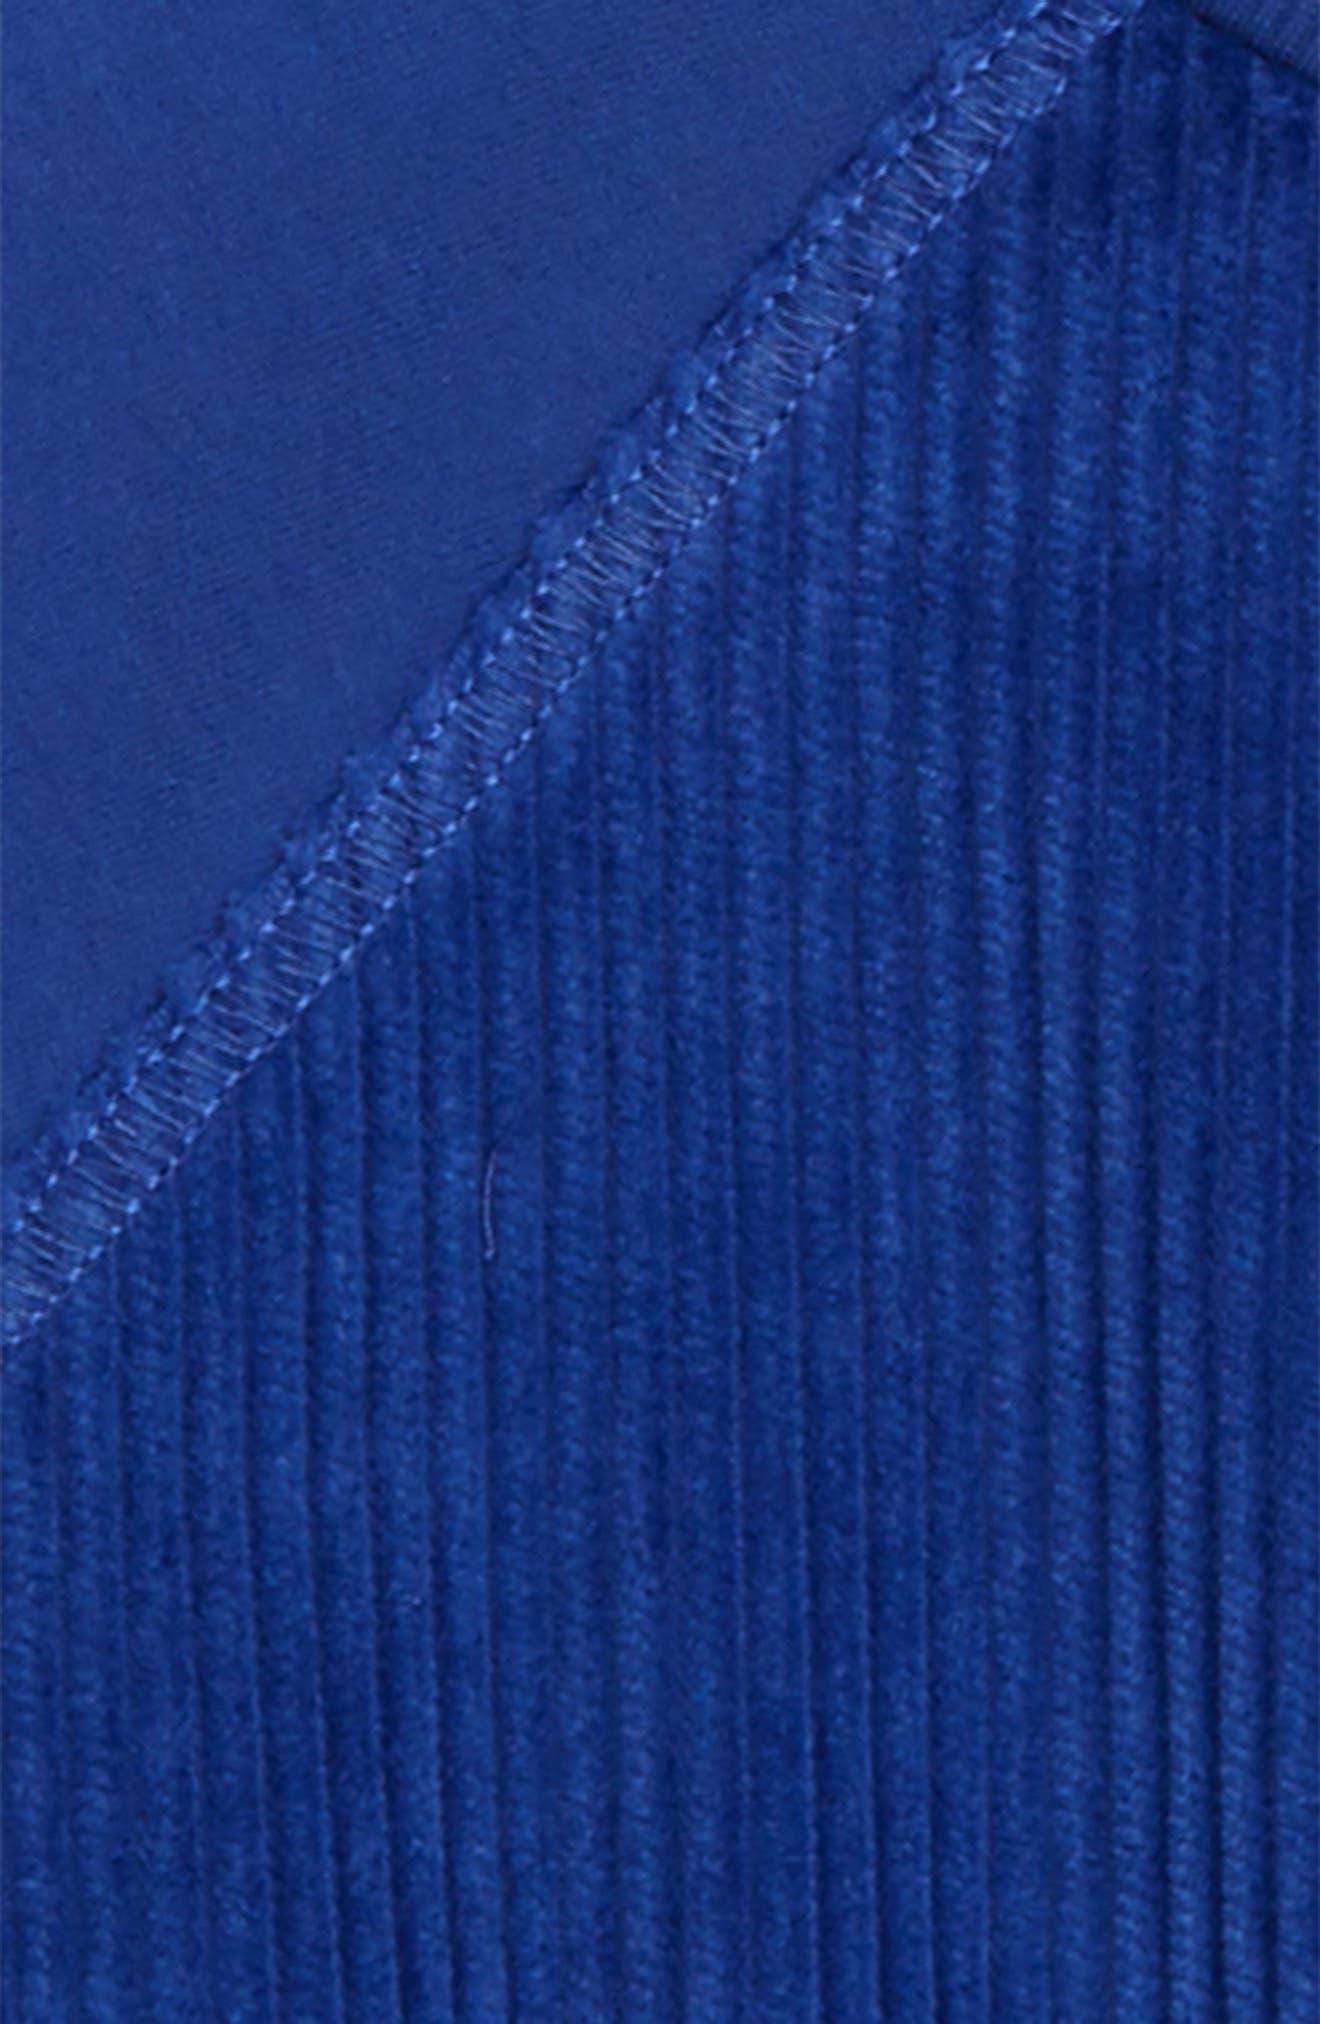 Corduroy Sweatshirt,                             Alternate thumbnail 2, color,                             401